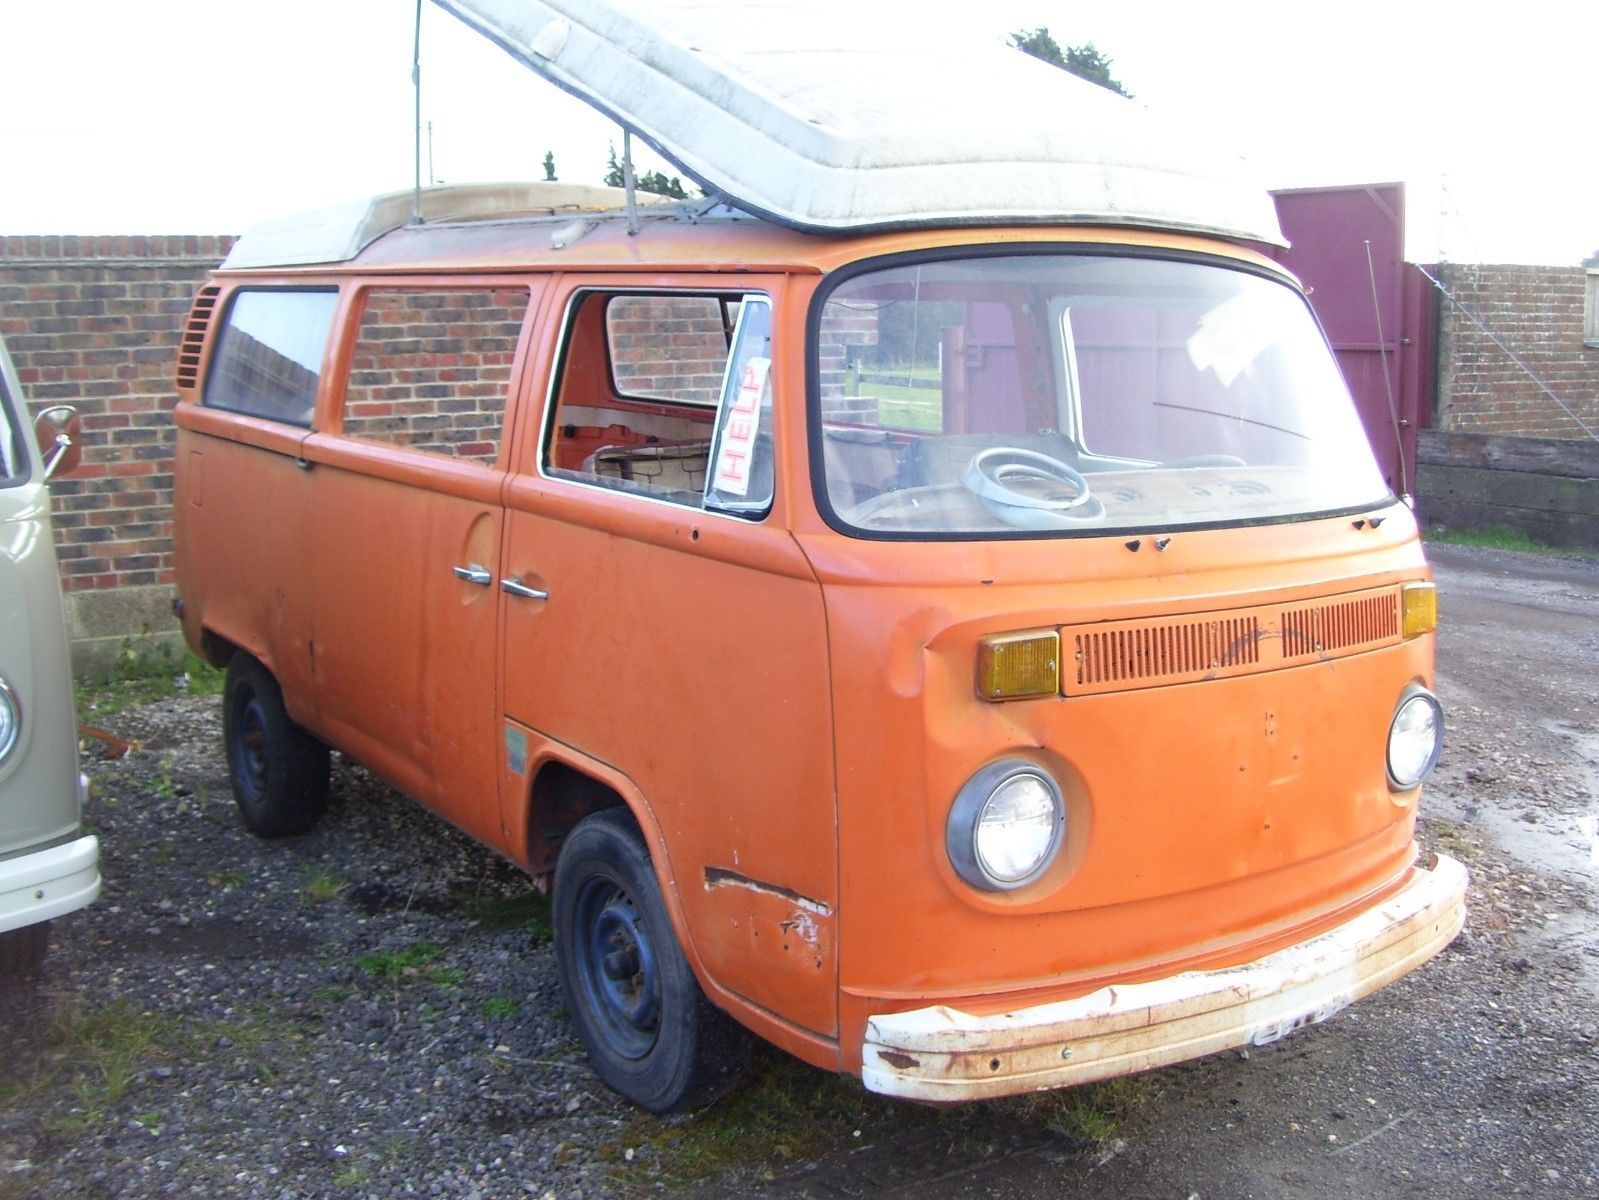 d20dd42a57 eBay  VW camper project 1973 Westfalia California Import  vwcamper  vwbus   vw